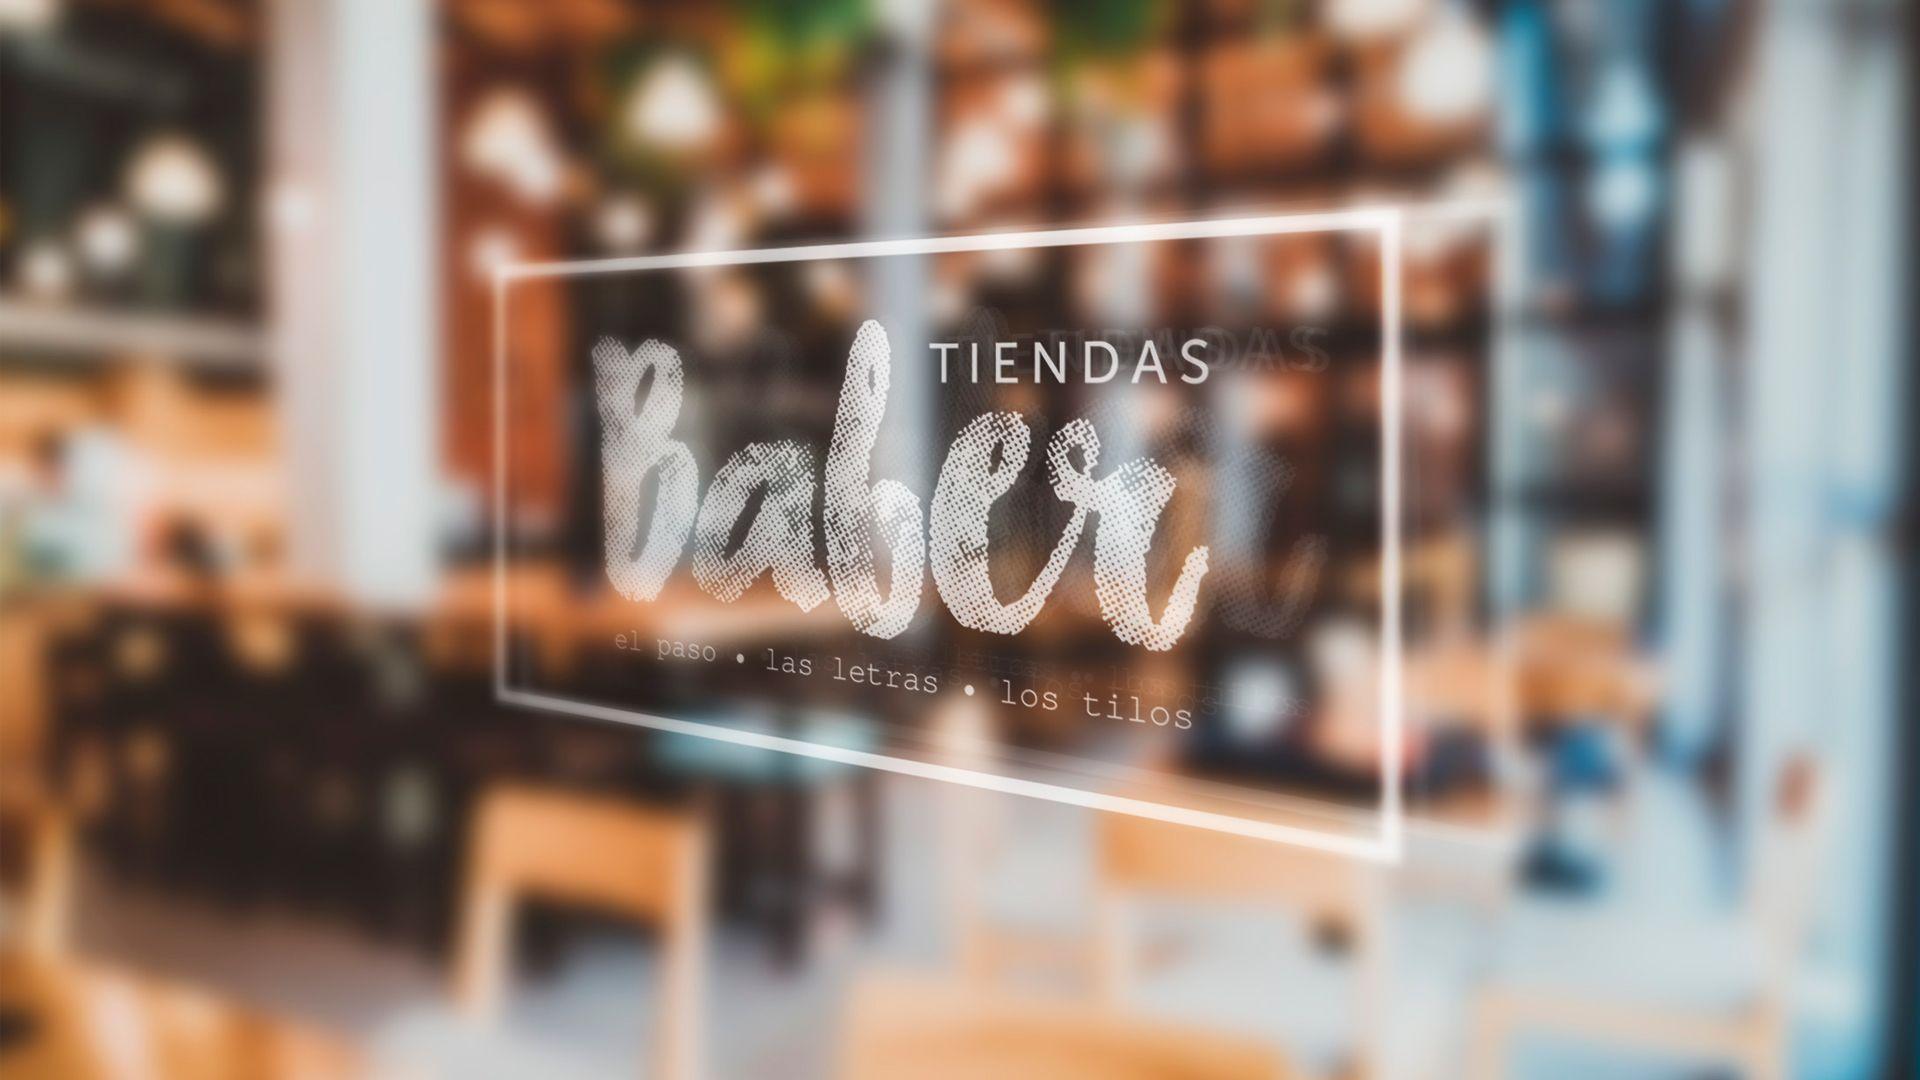 Tiendas Baber